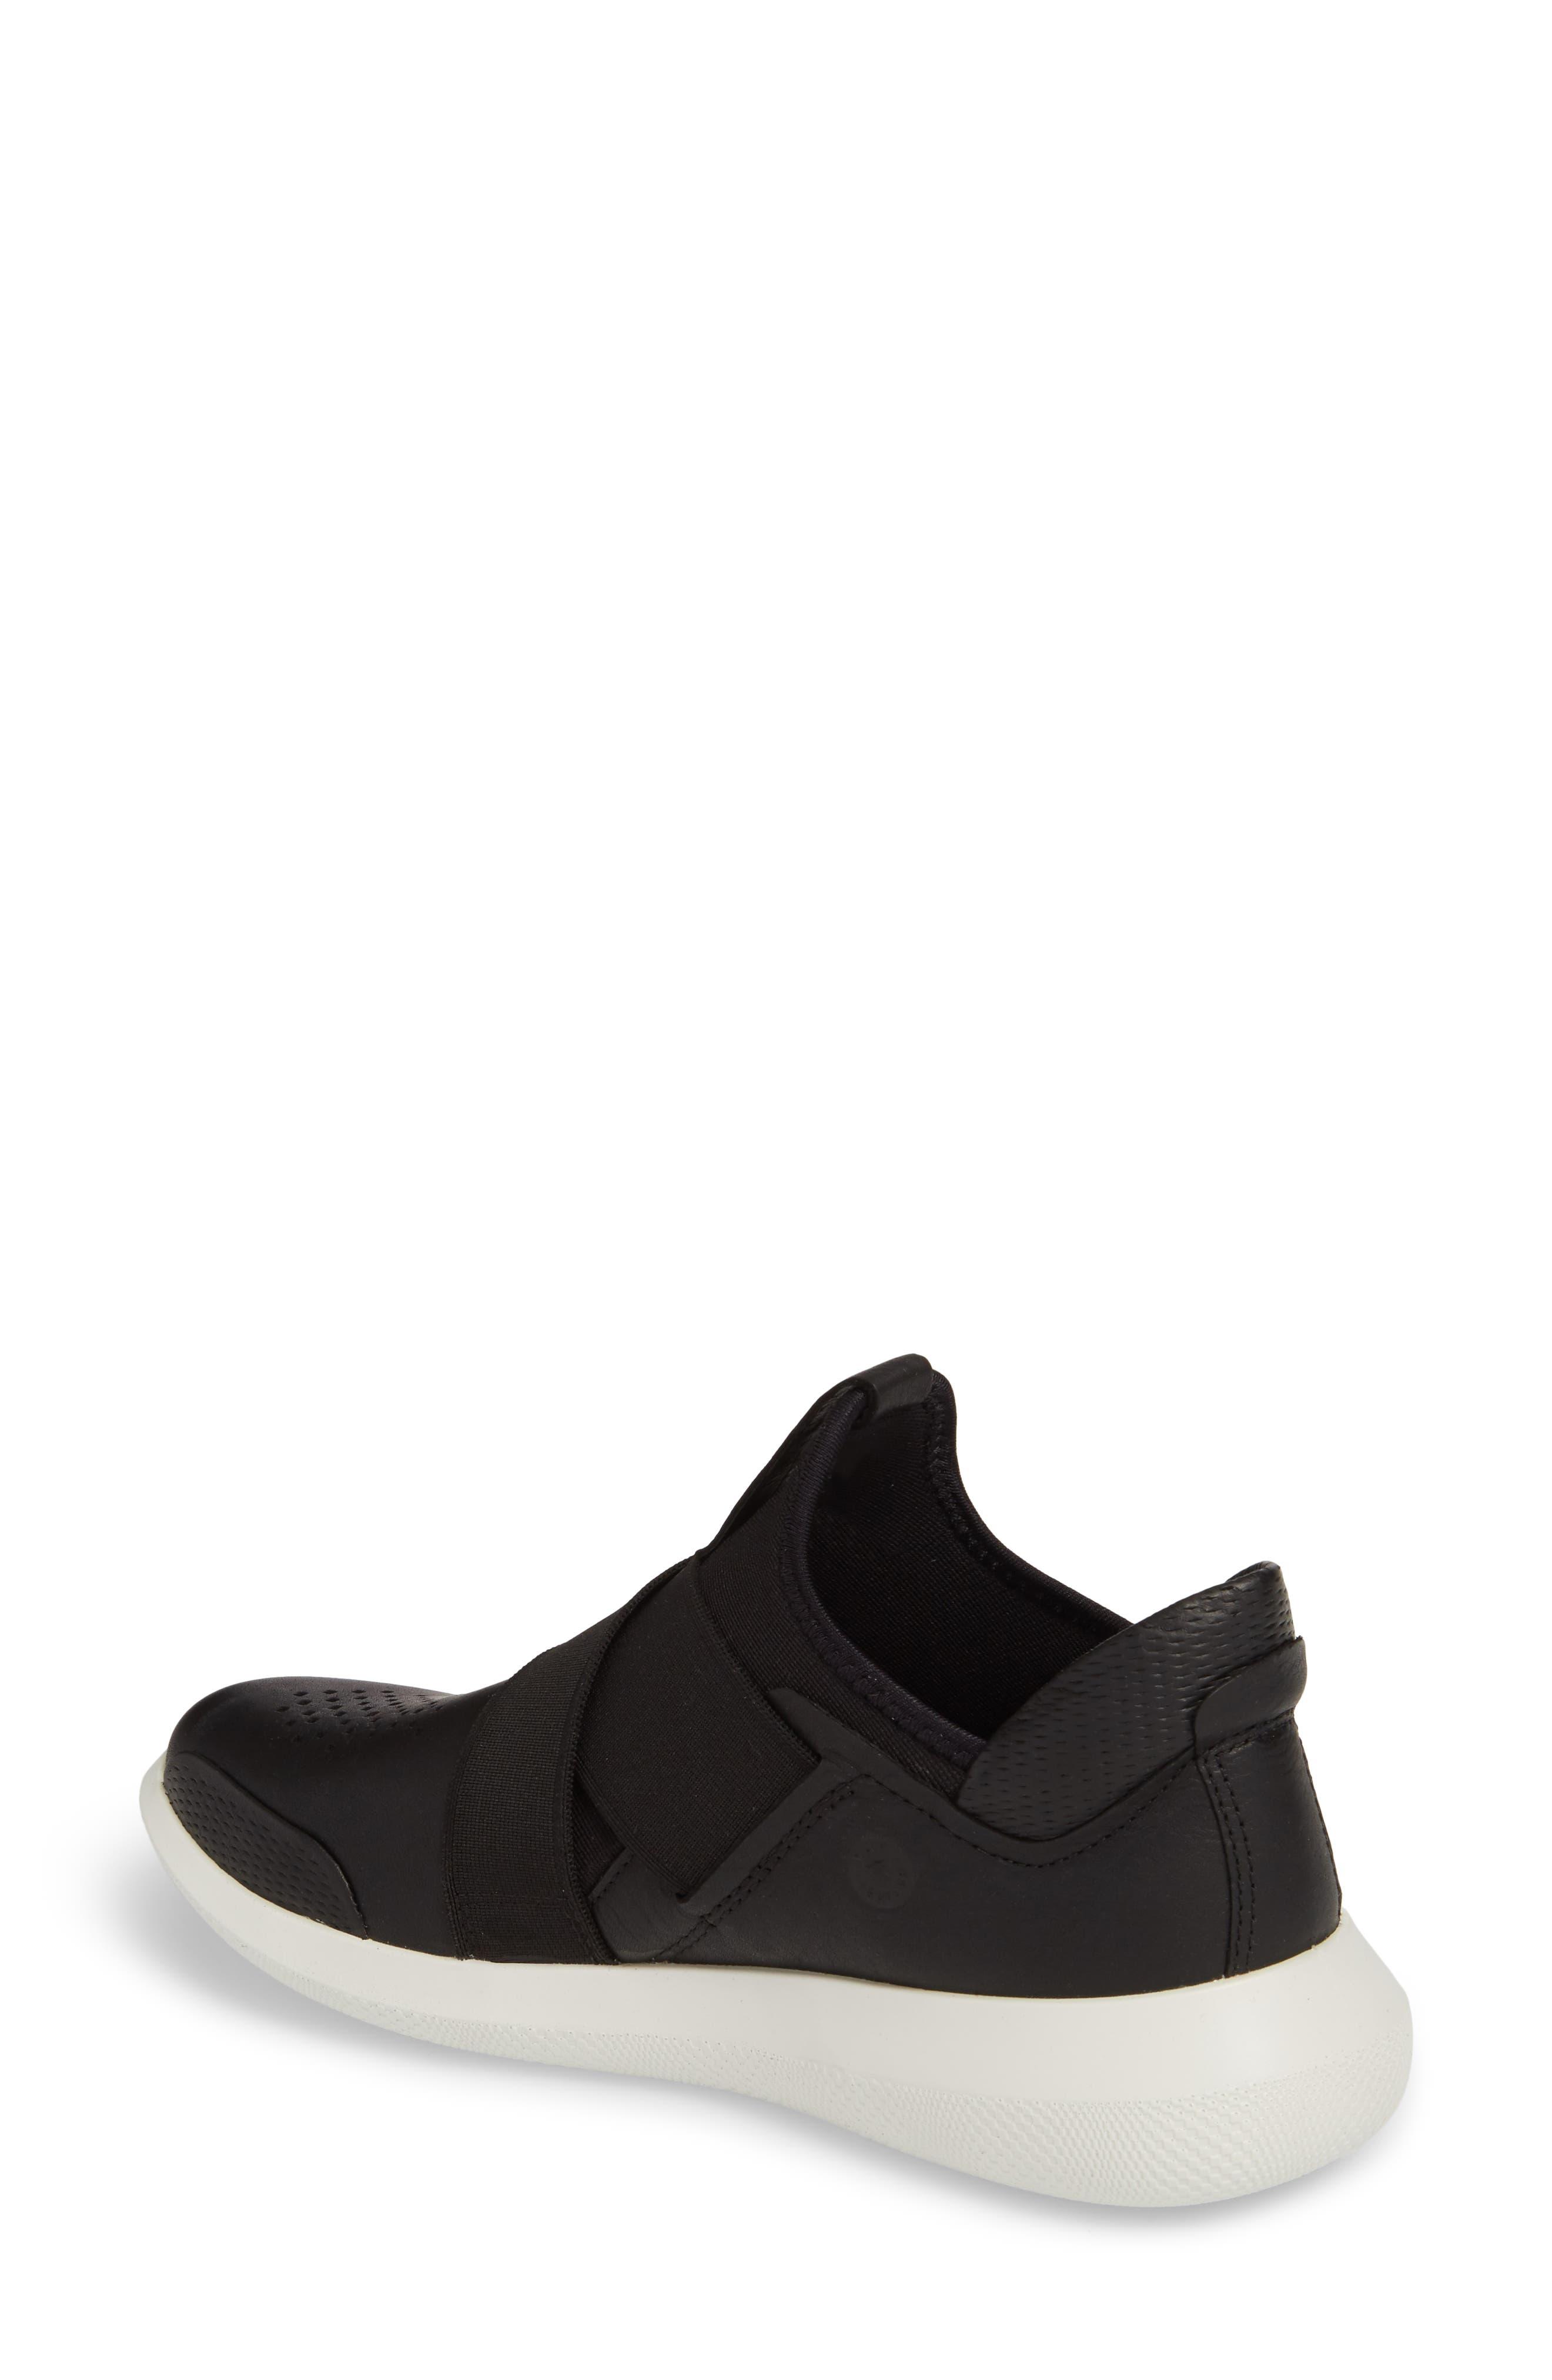 Scinapse Band Sneaker,                             Alternate thumbnail 2, color,                             Black